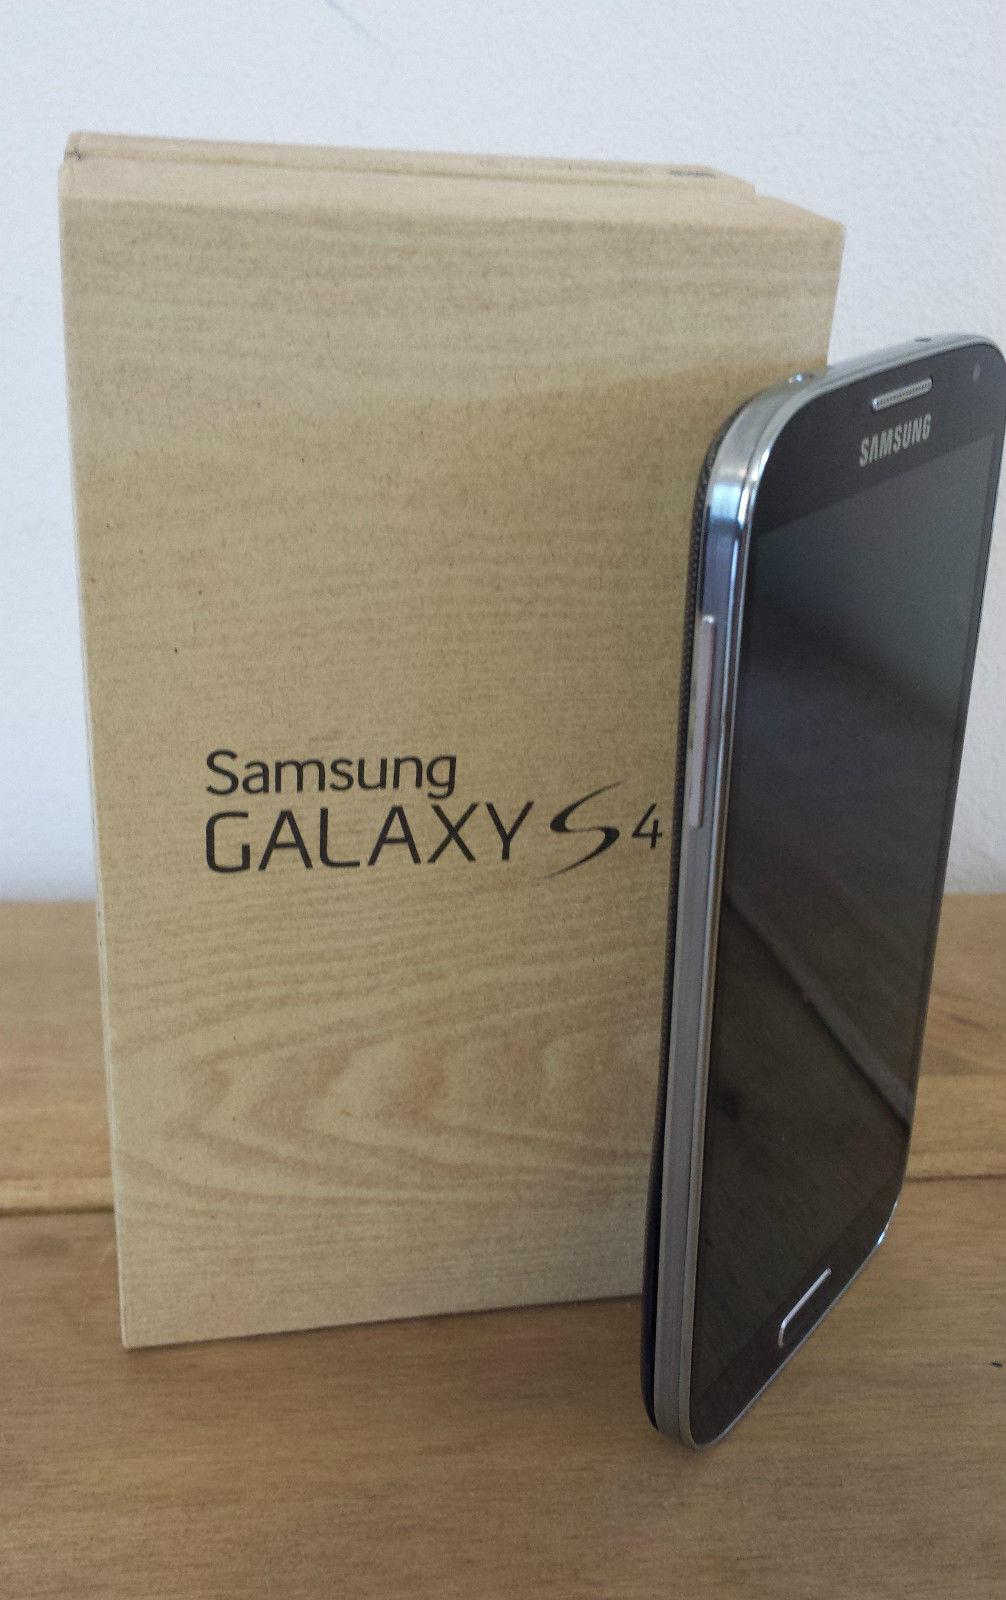 Samsung Galaxy S 4 GT-I9505 (Latest Model) - 16 GB - Black Mist (Unlocked)...